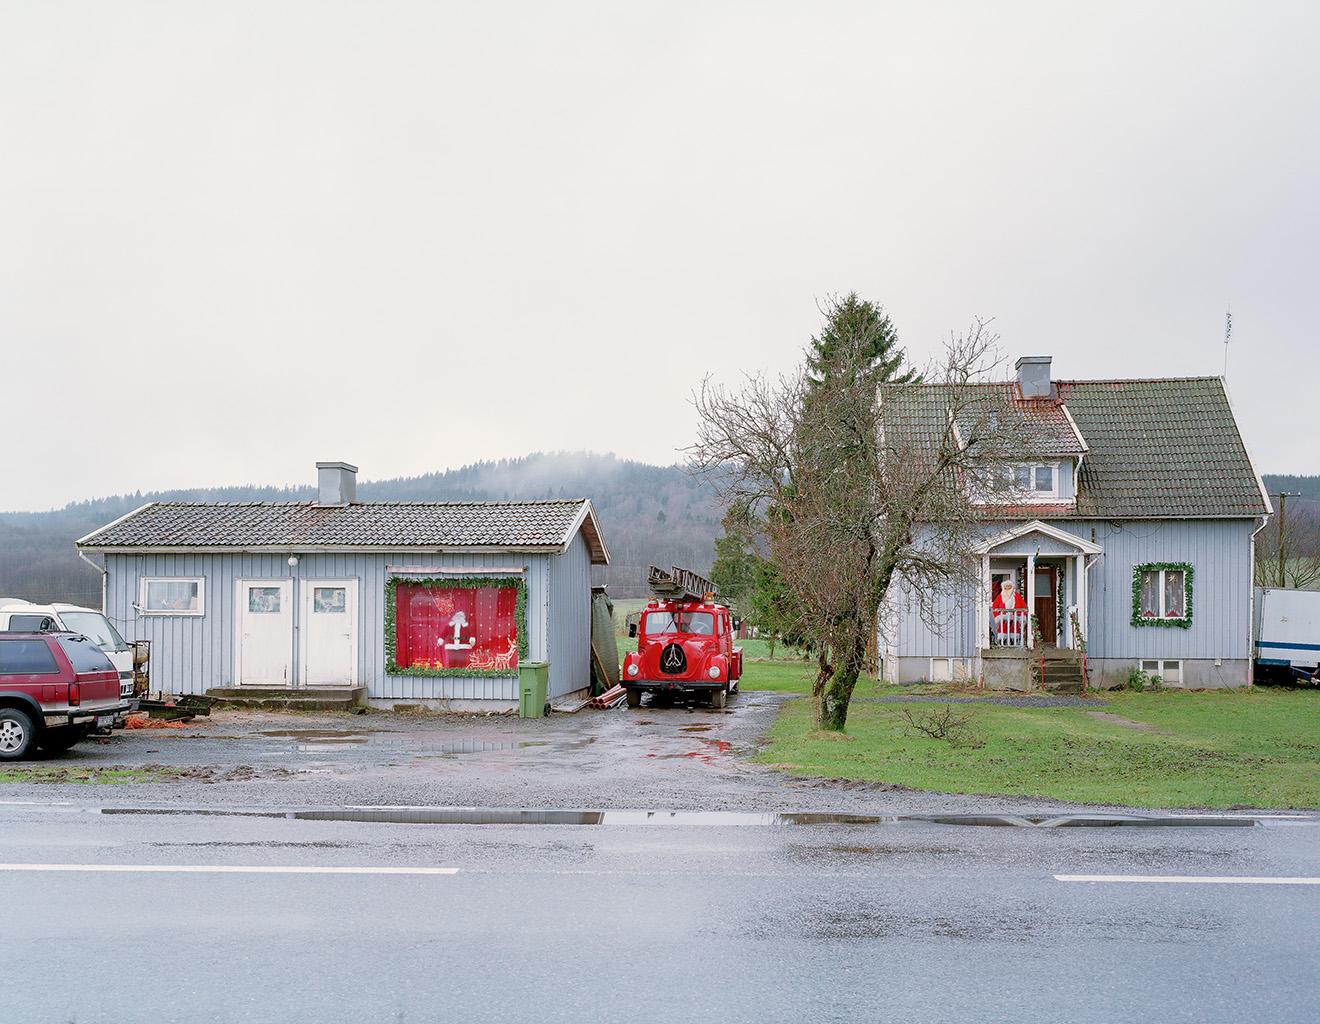 Björketorp, 17 December 2006